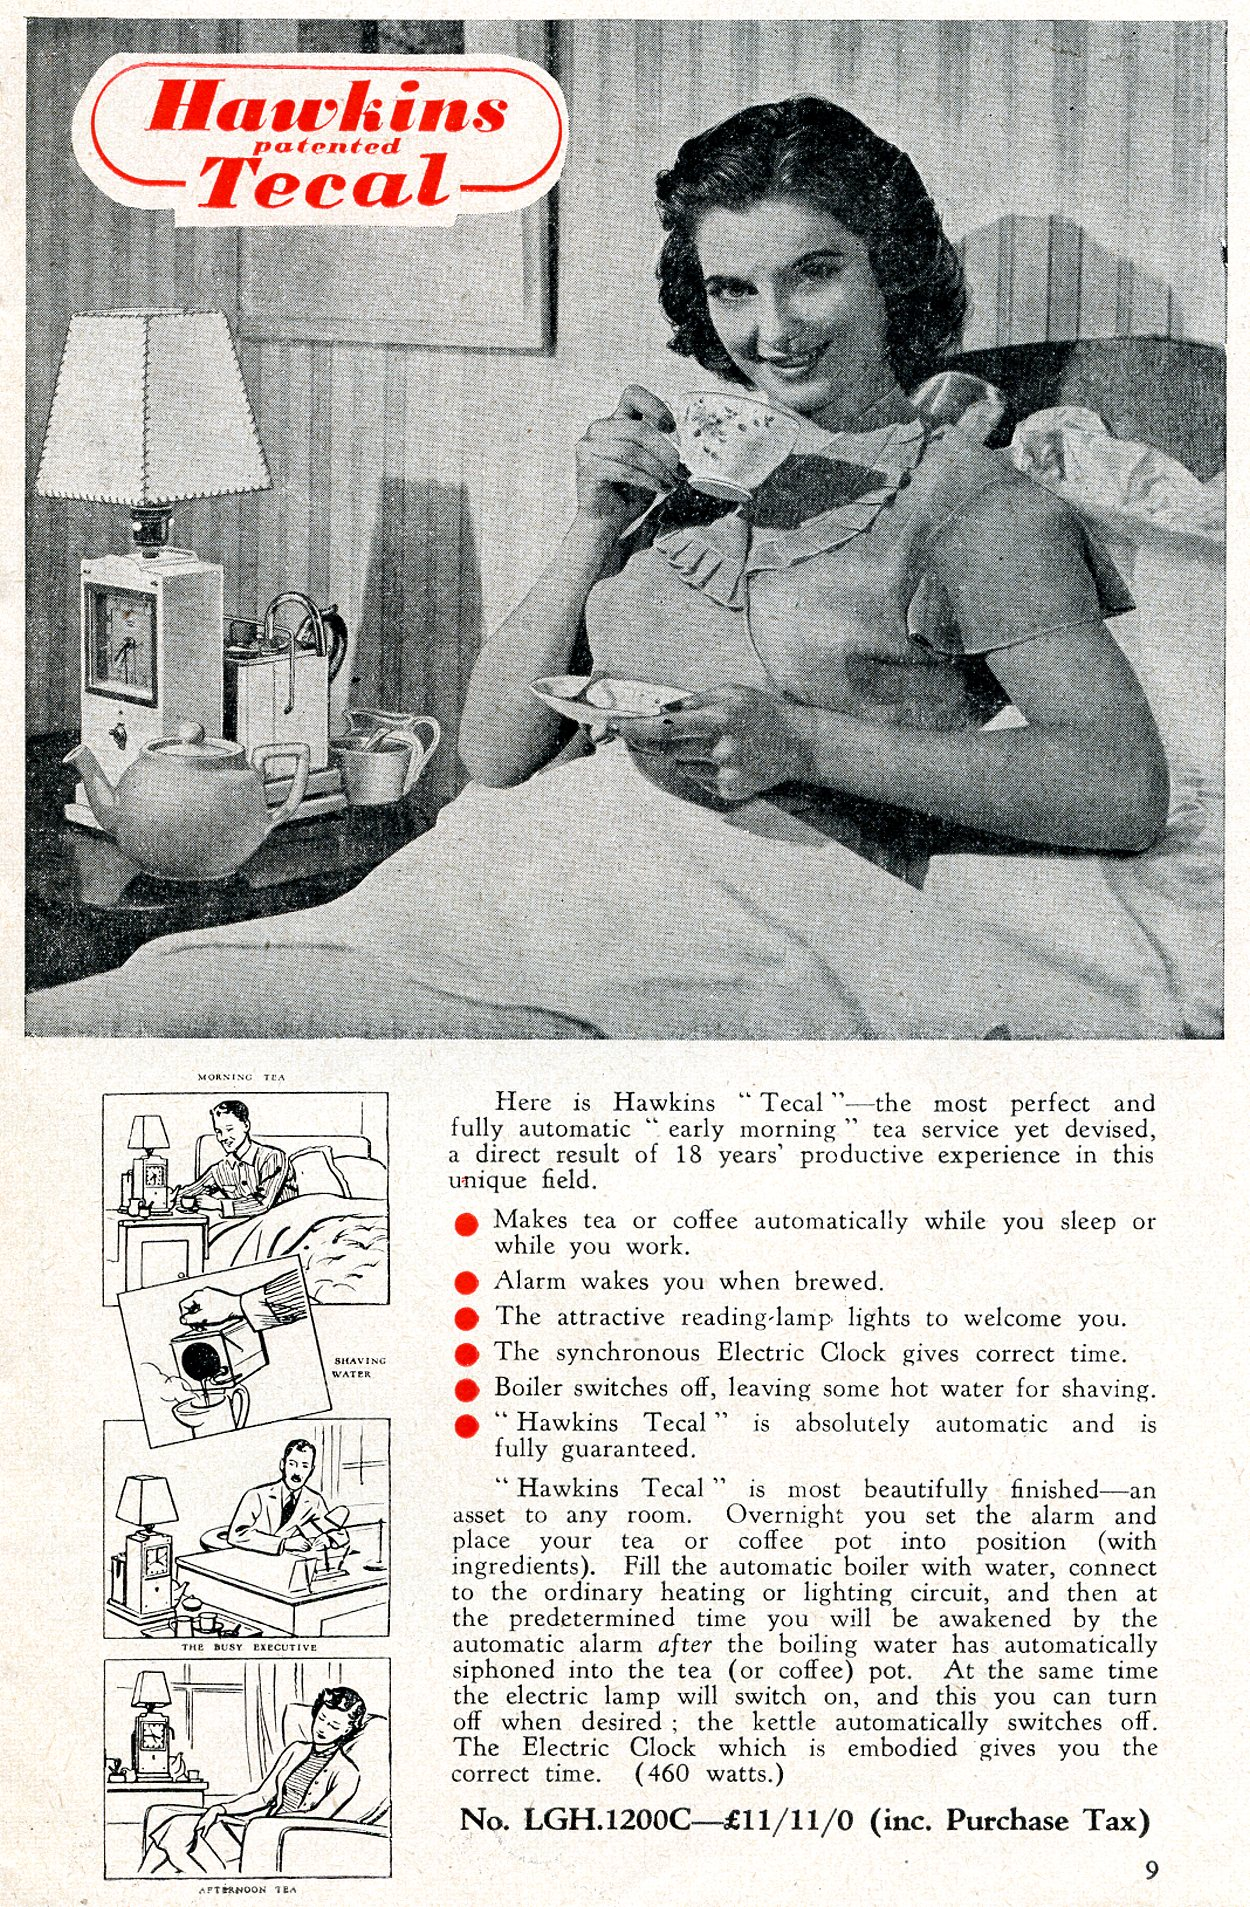 Hawkins Tecal 1200c advert Silver Lining Dec 1952